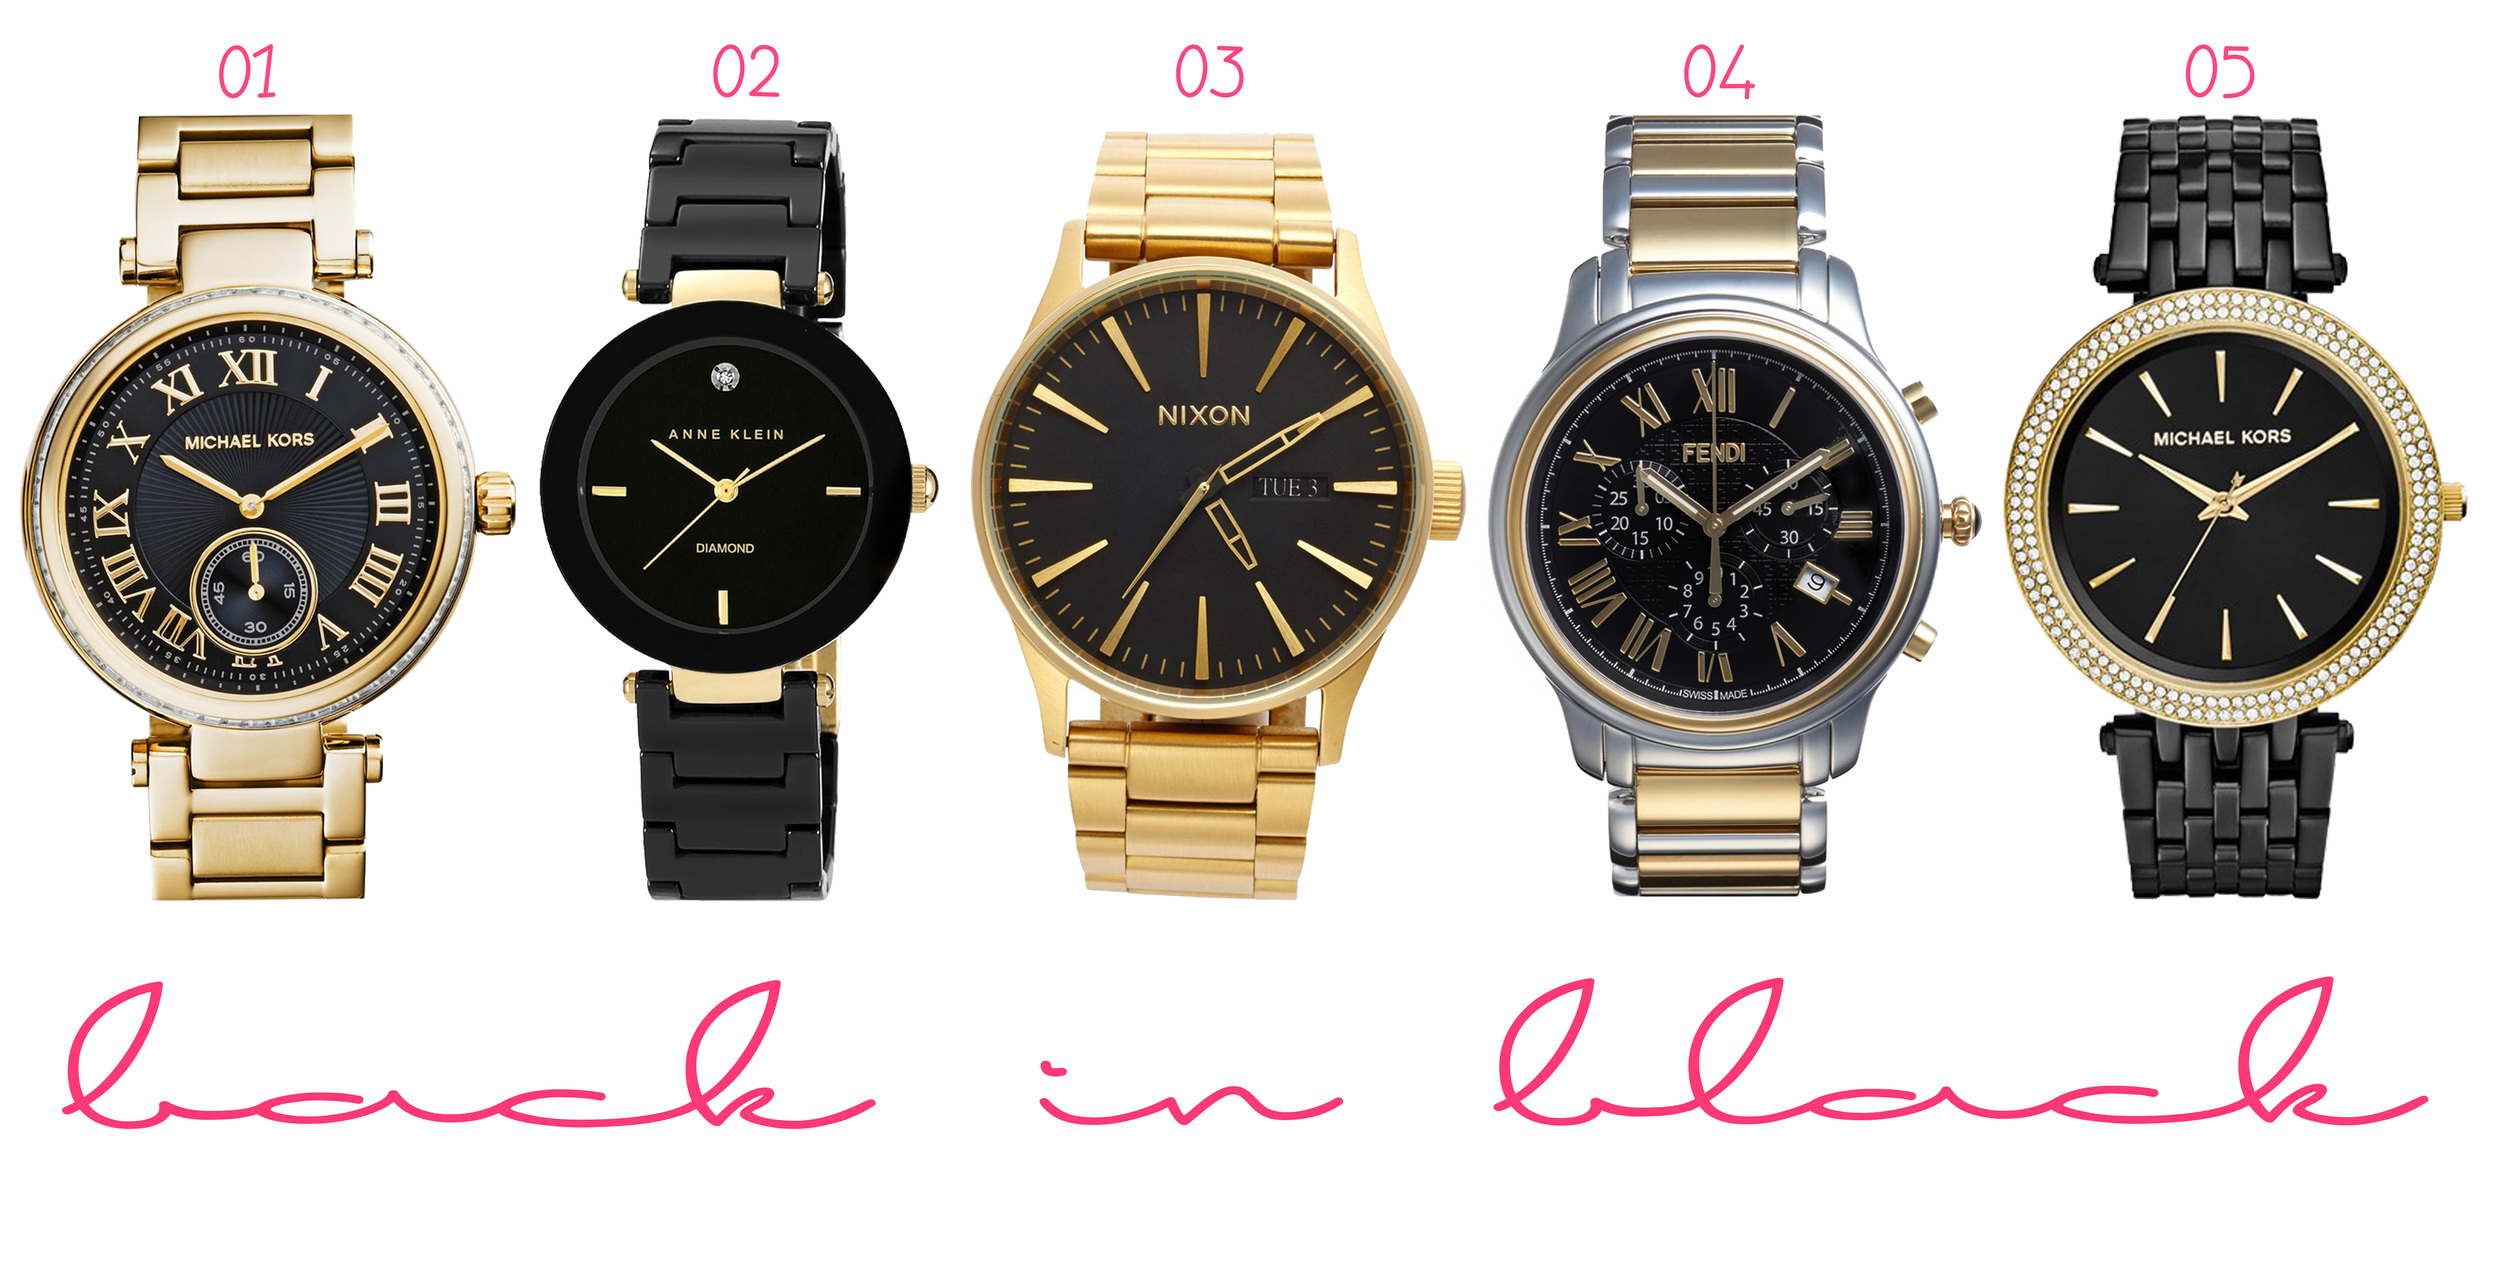 01.  MICHAEL Michael Kors 'Skylar' Crystal Bezel Bracelet Watch  ($275) - 02.  Anne Klein Round Ceramic Bracelet Watch  ($110 )- 03.  Nixon 'Sentry' Bracelet Watch  ($250) - 04.  Fendi 'Classico' Chronograph Bracelet Watch  ($1,295) - 05.  MICHAEL Michael Kors 'Darci' Crystal Bezel Bracelet Watch  ($225)